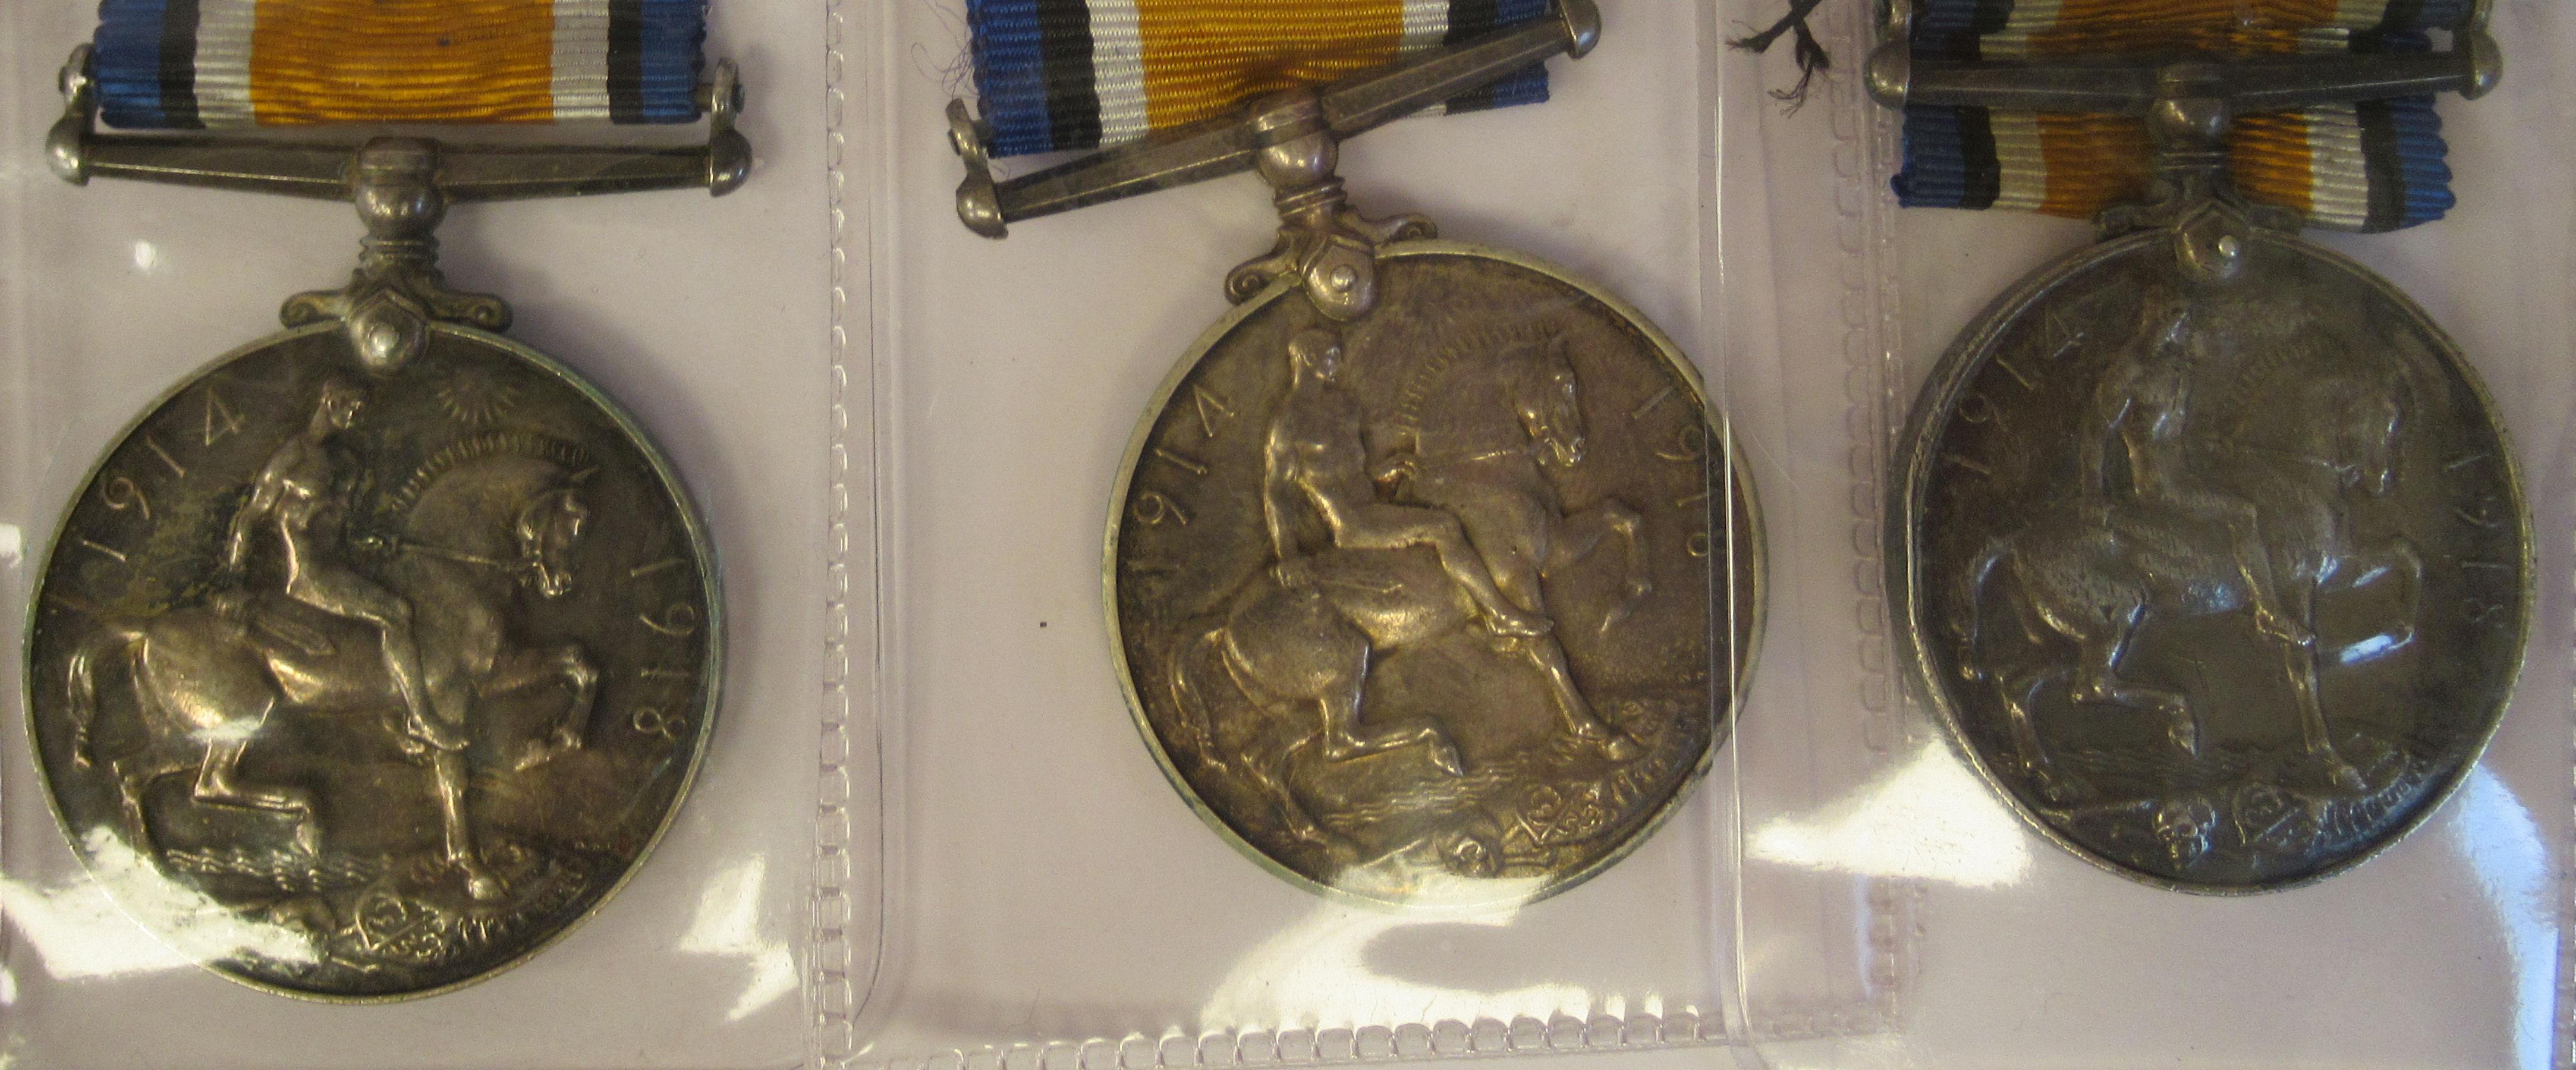 Twenty-four Great War 1914-1918 British service medals on ribbons, viz. 46481, Gnr. E. Williamson - Image 13 of 16